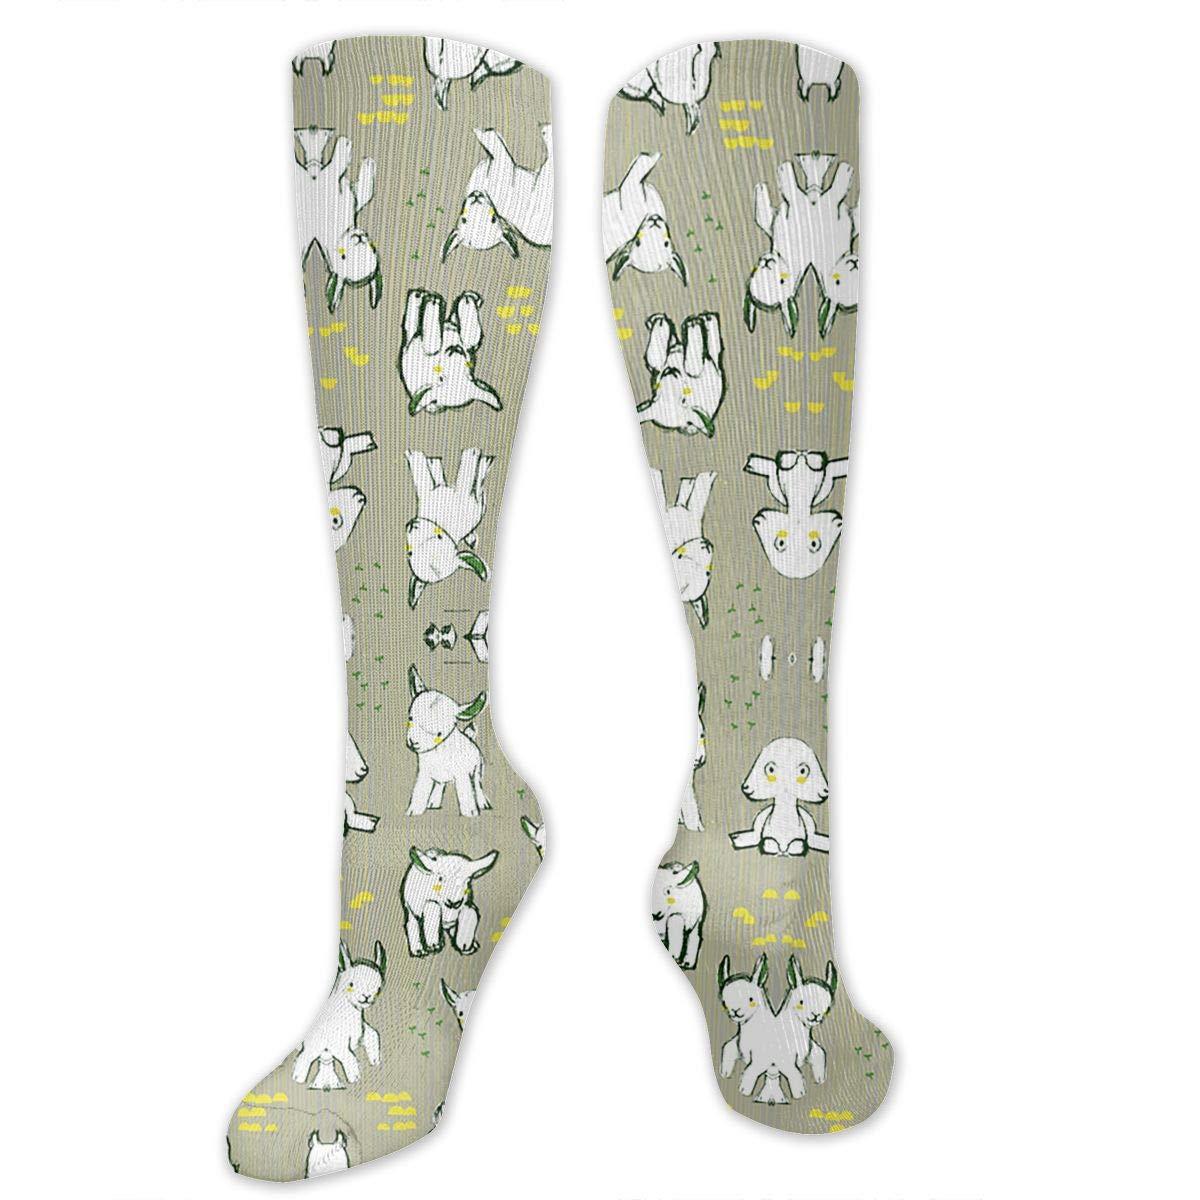 Willbegood99 Baby Goats in Grey Mens Fun Dress Socks Colorful Pattened Novelty Mid-Calf Crew Socks Premium Cotton Vibrant Art Socks